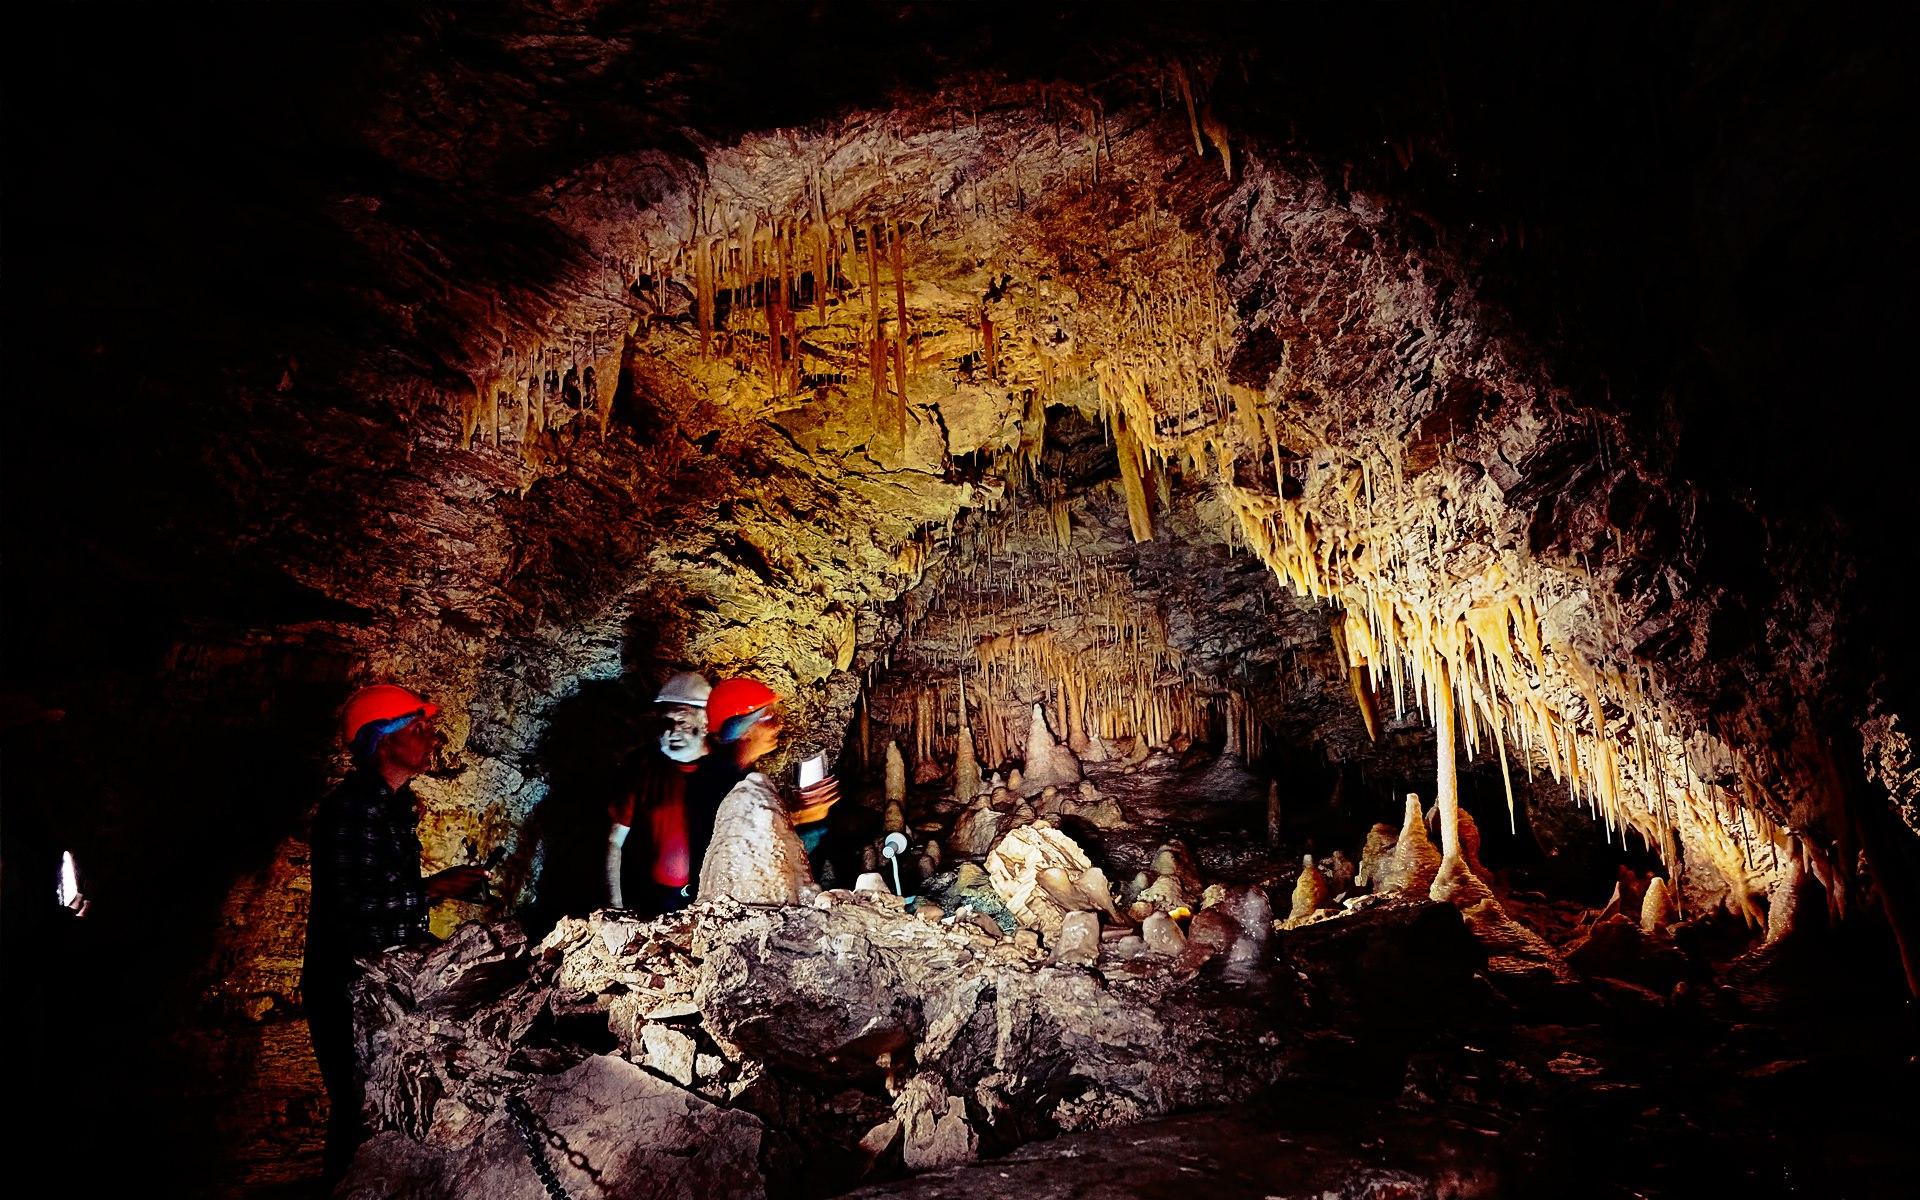 caves-kaikoura-cave-tour-03